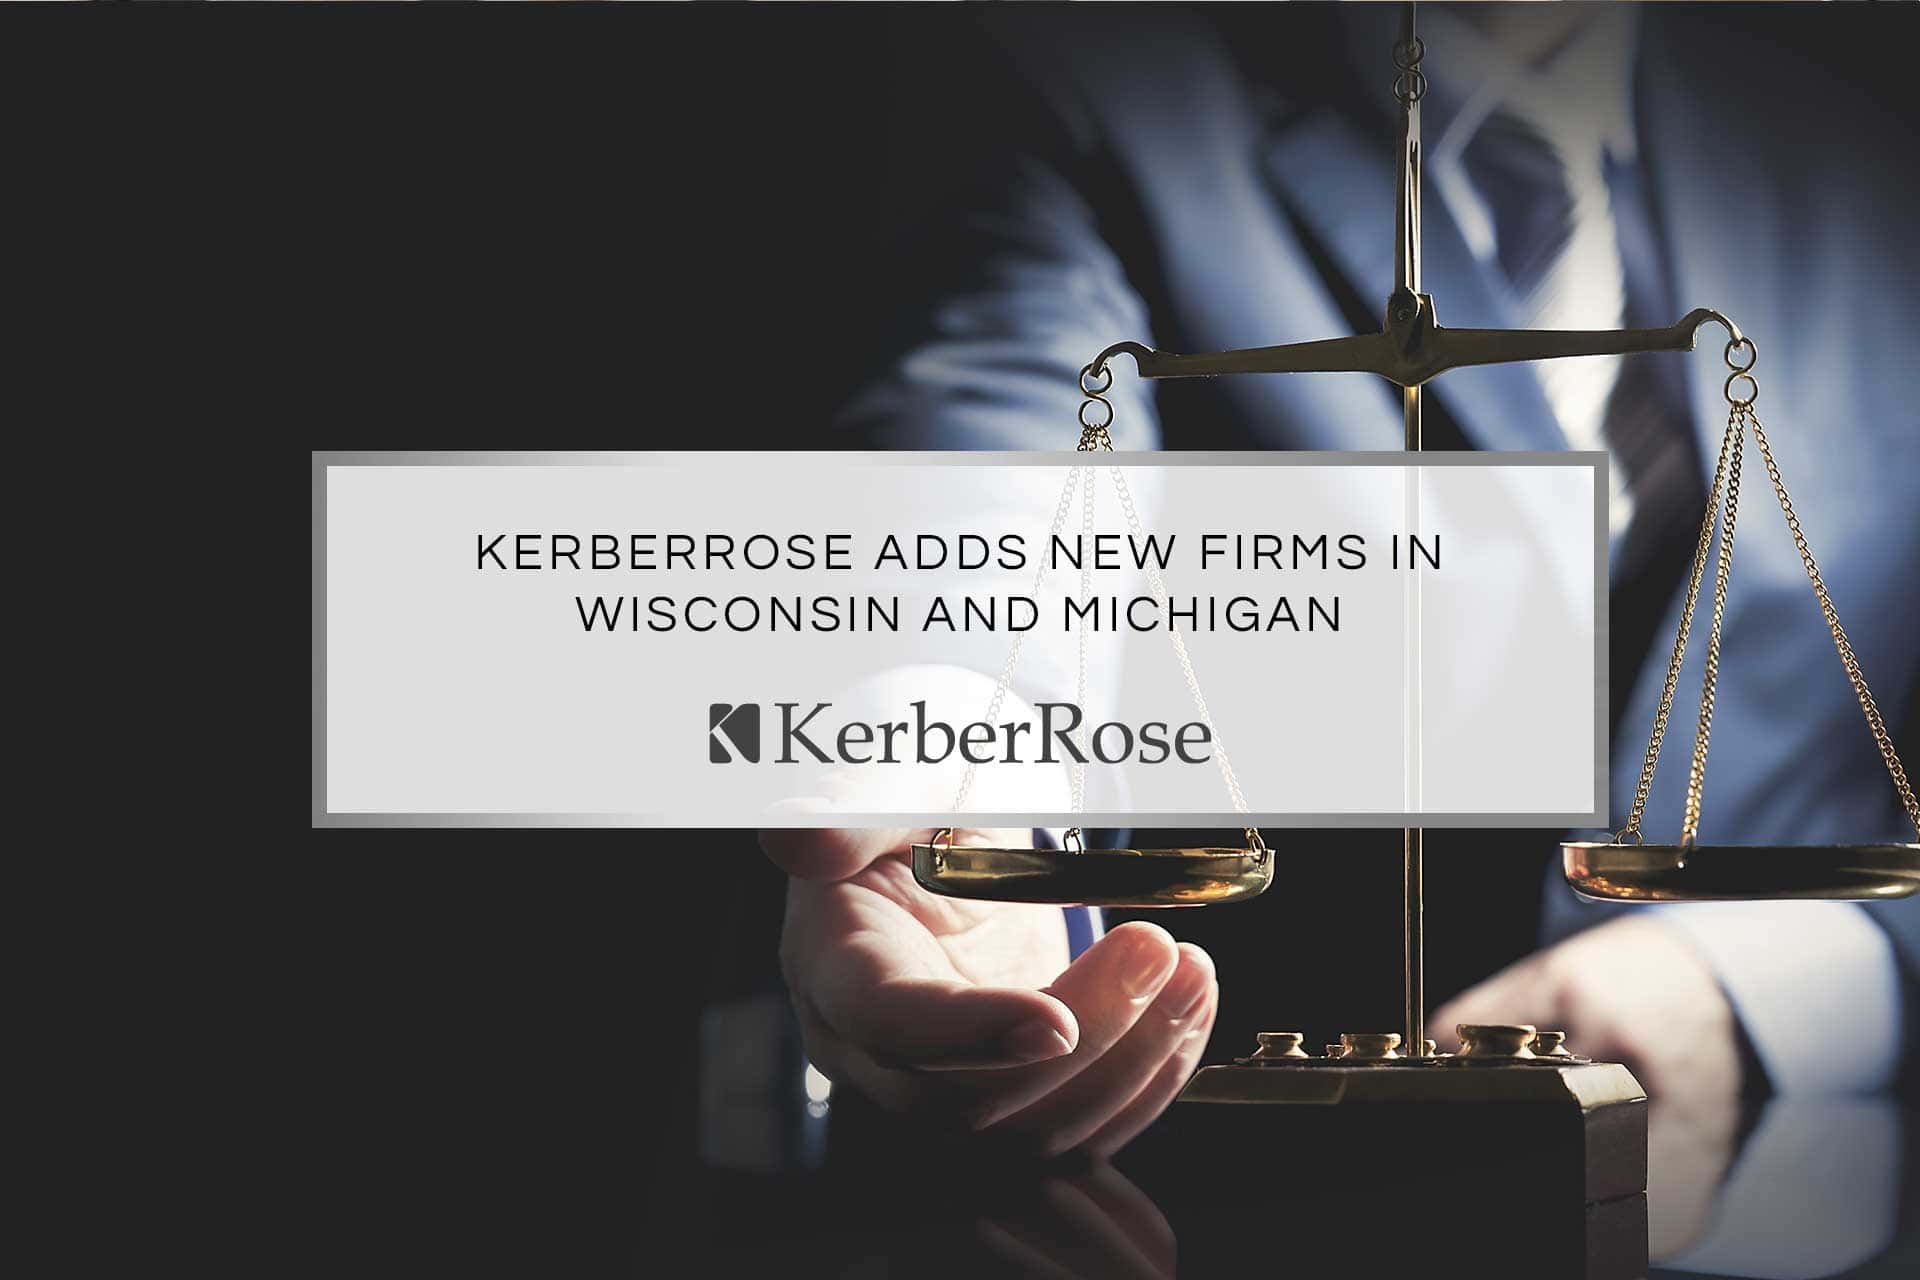 KerberRose Adds New Firms in Wisconsin and Michigan | KerberRose